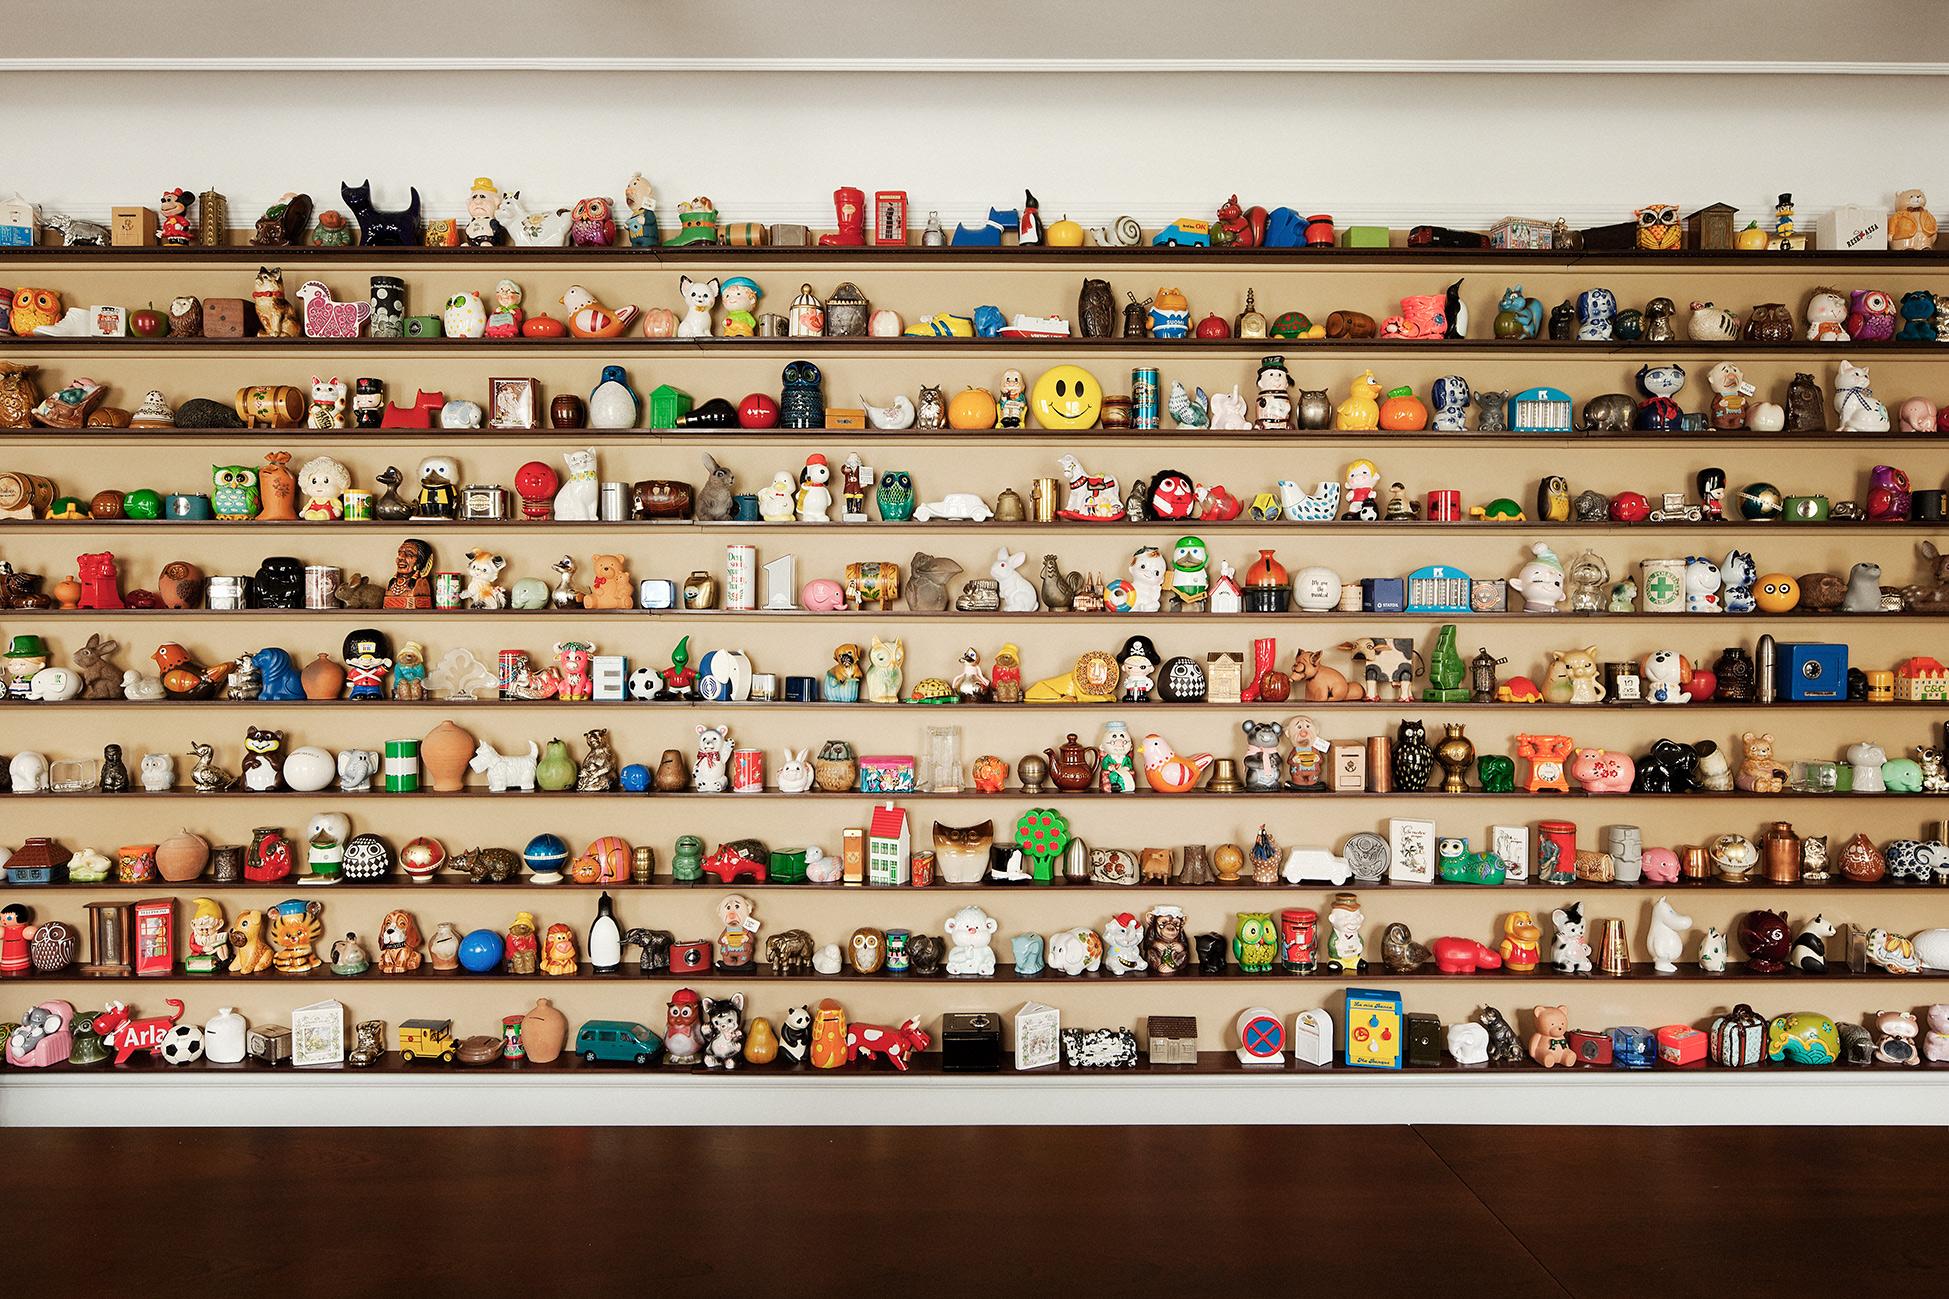 Erik Penser Collection